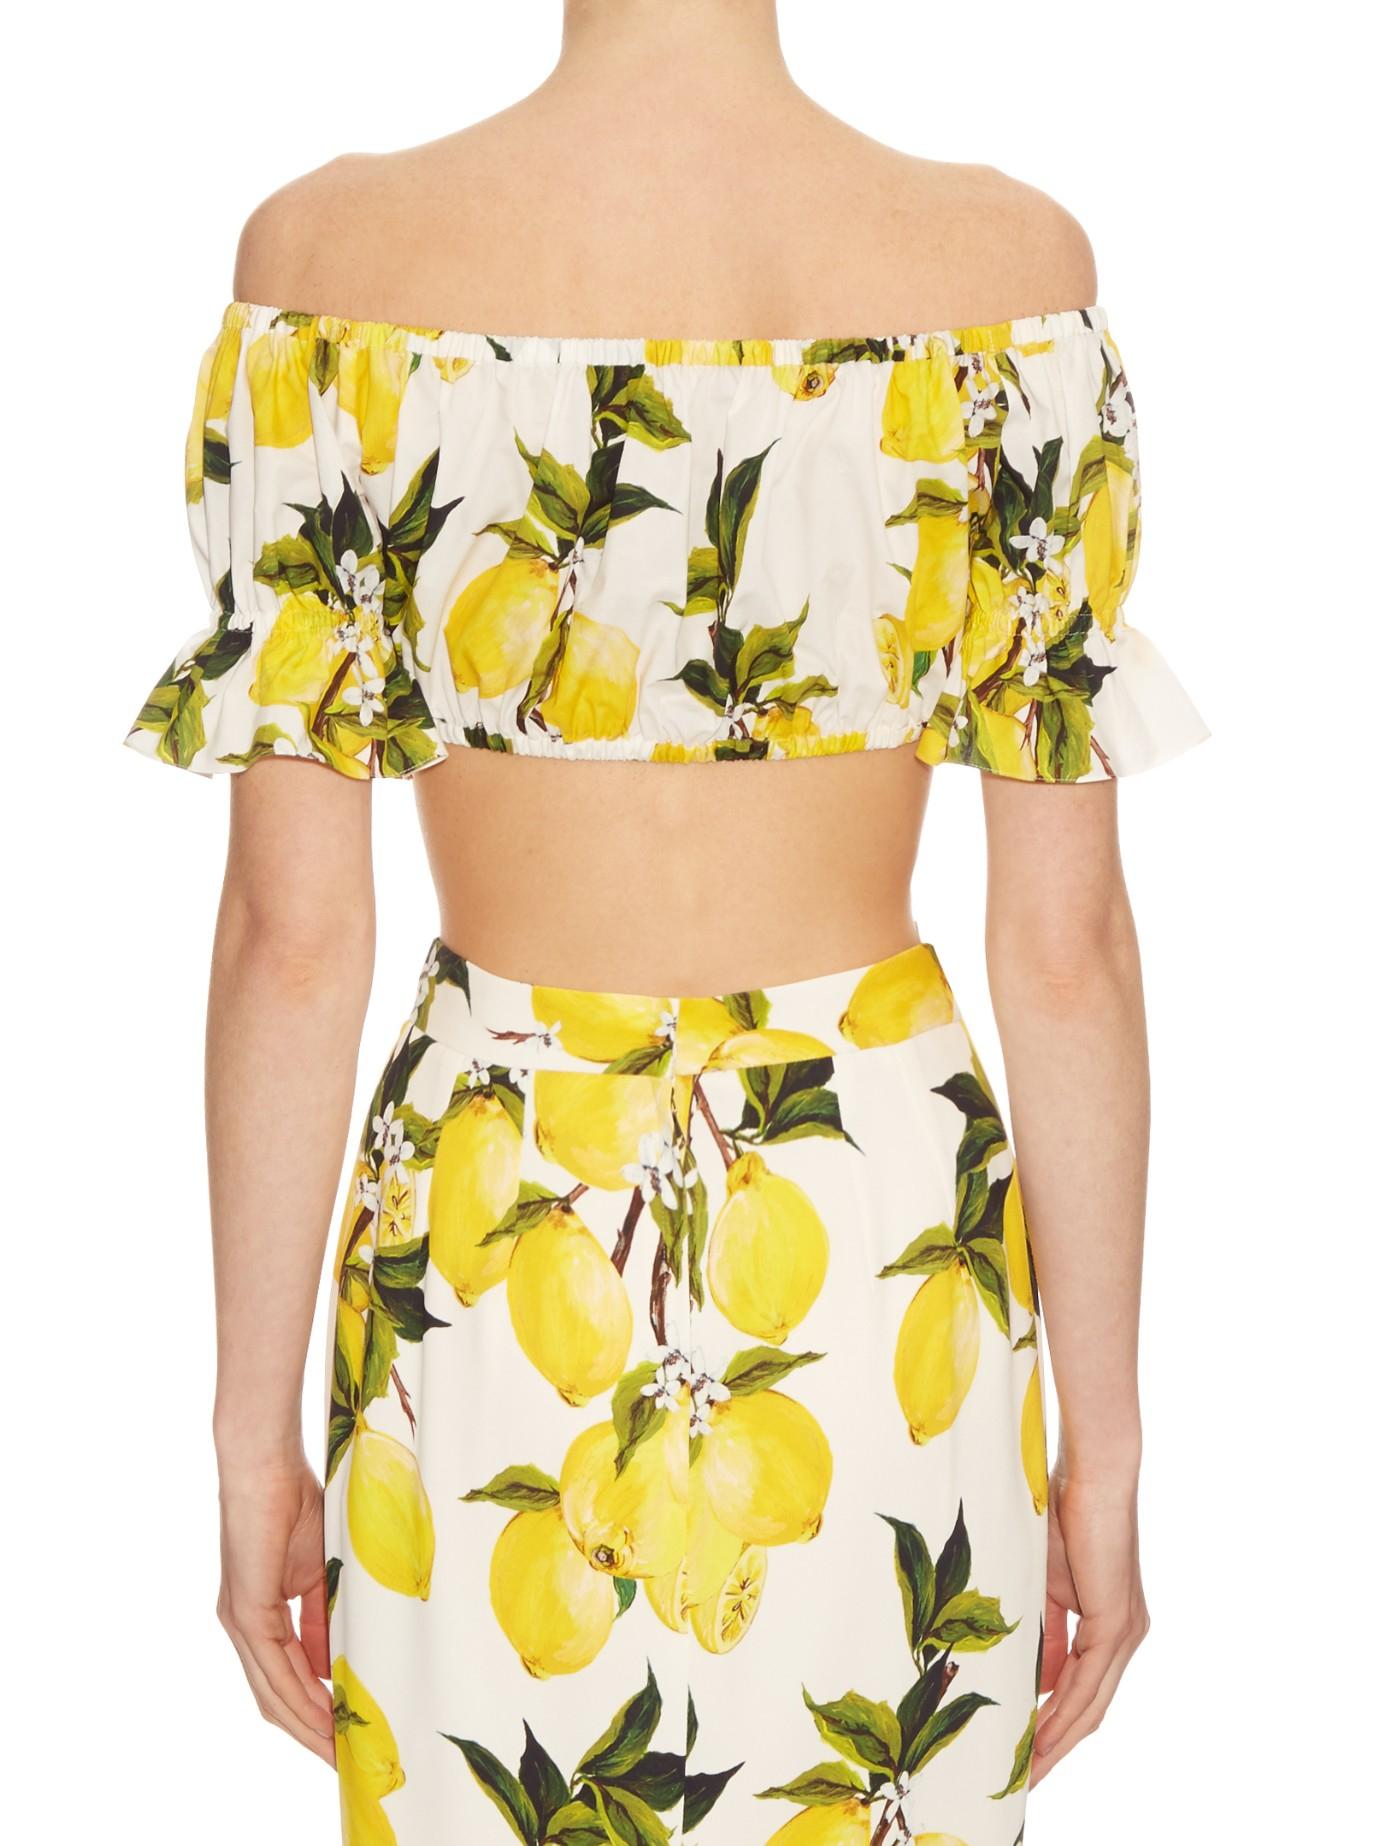 Lyst - Dolce   Gabbana Lemon-print Off-the-shoulder Top in Yellow 7d43b3aa690e8